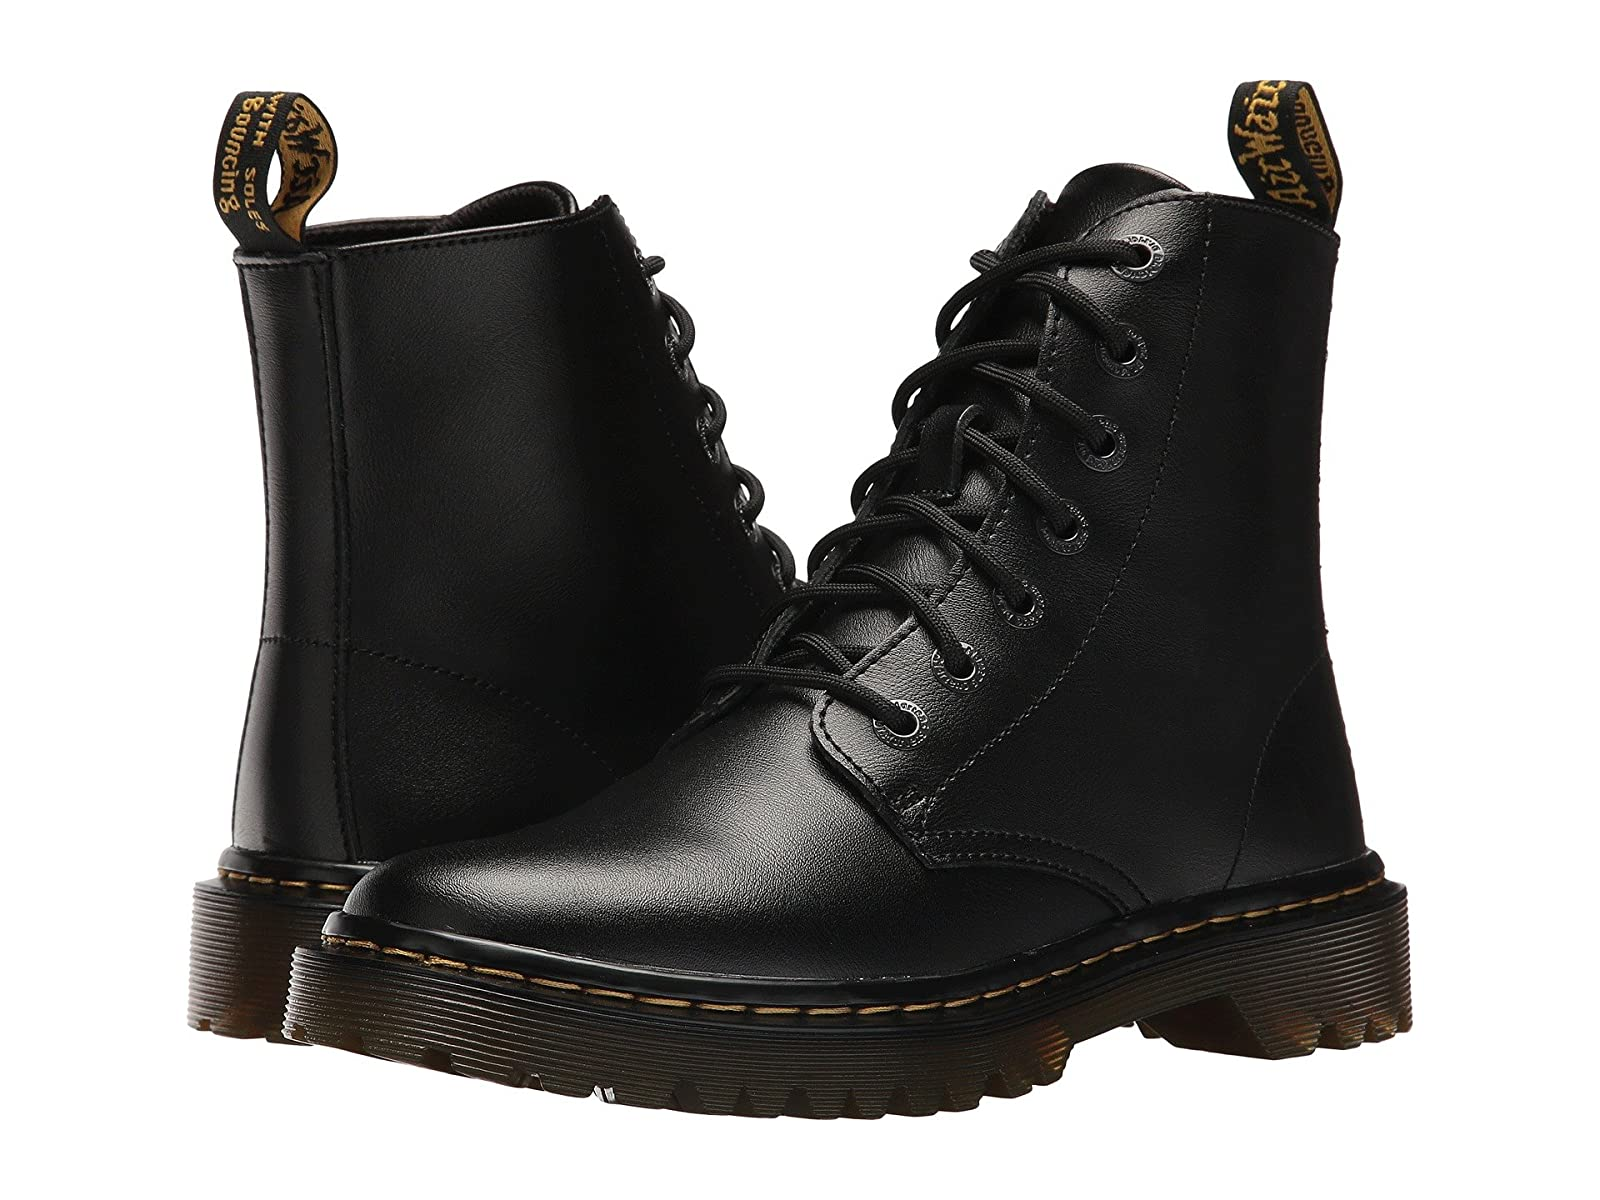 Dr. Martens LuanaCheap and distinctive eye-catching shoes